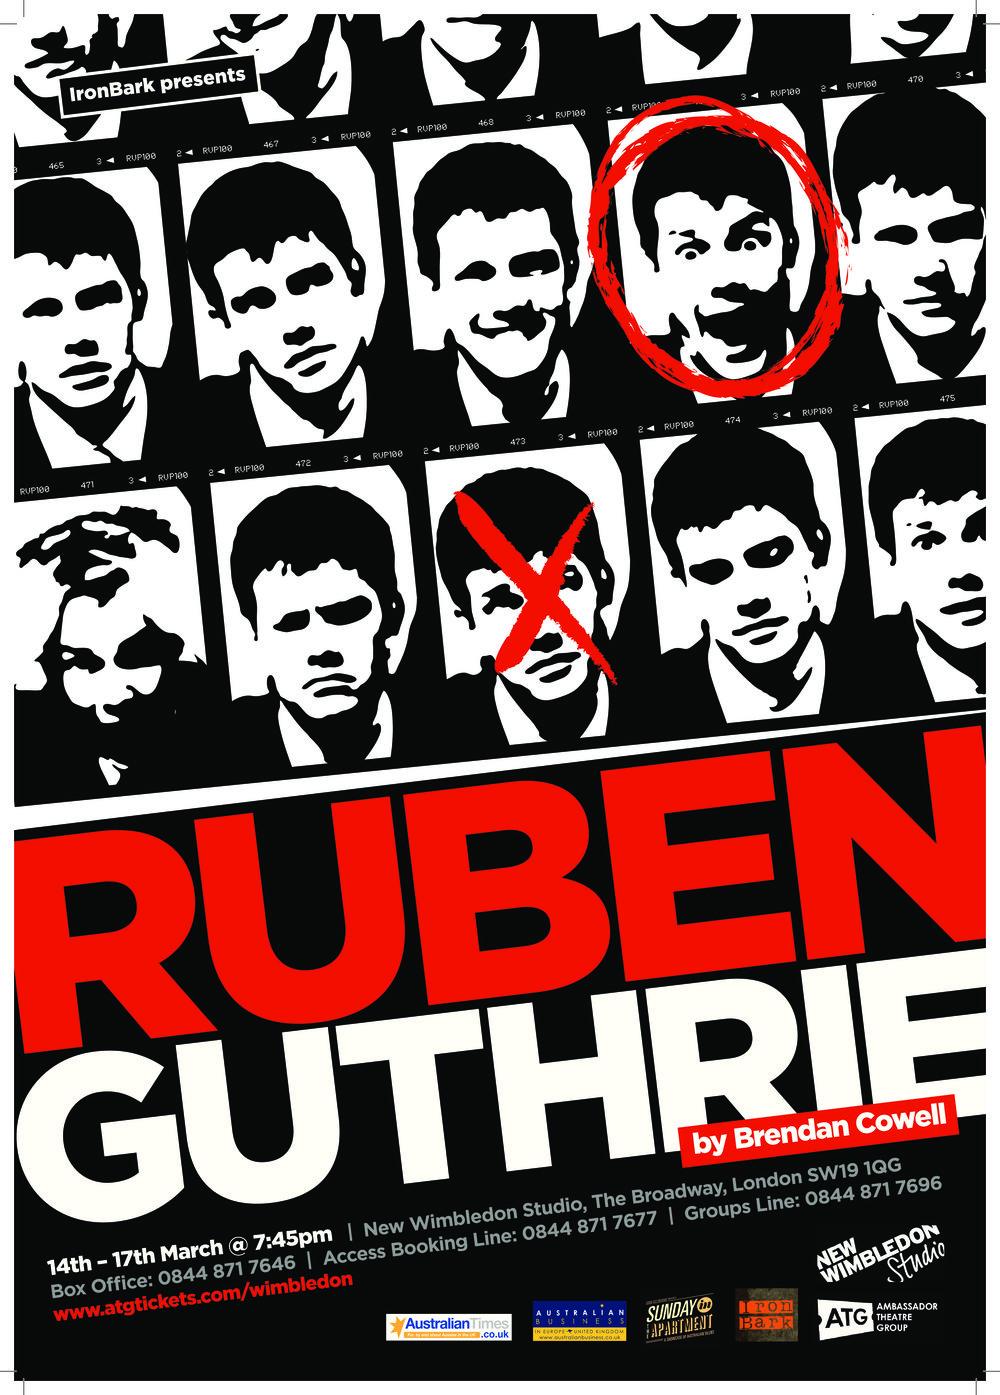 RG jpg poster.jpg